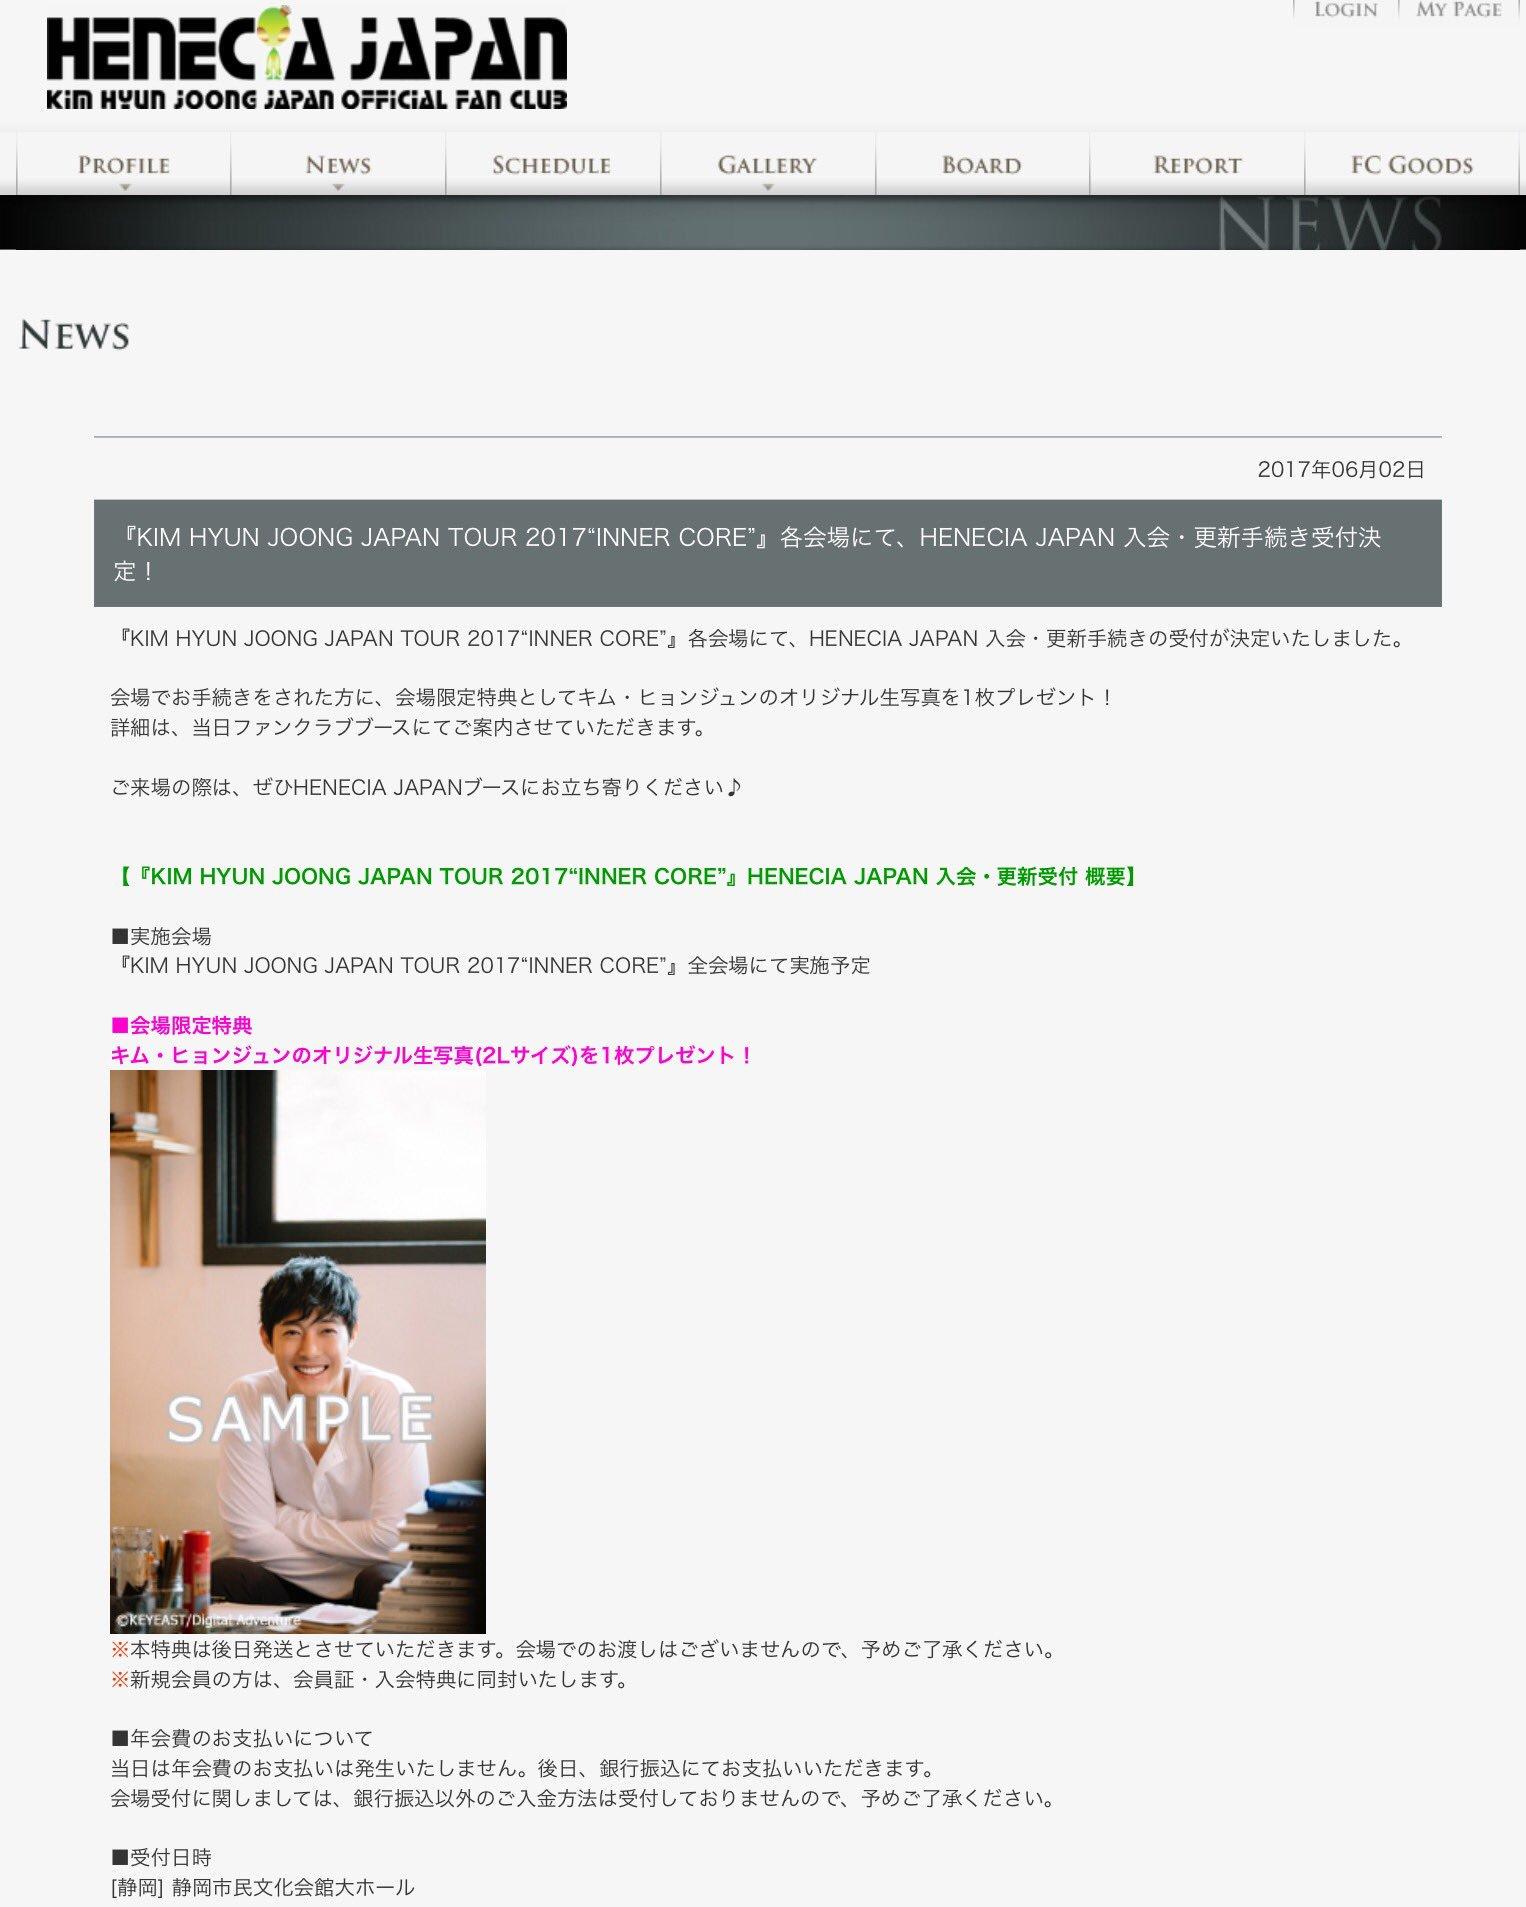 [Photo] Kim Hyun Joong Japan Mobile Site Update [17.06.06]